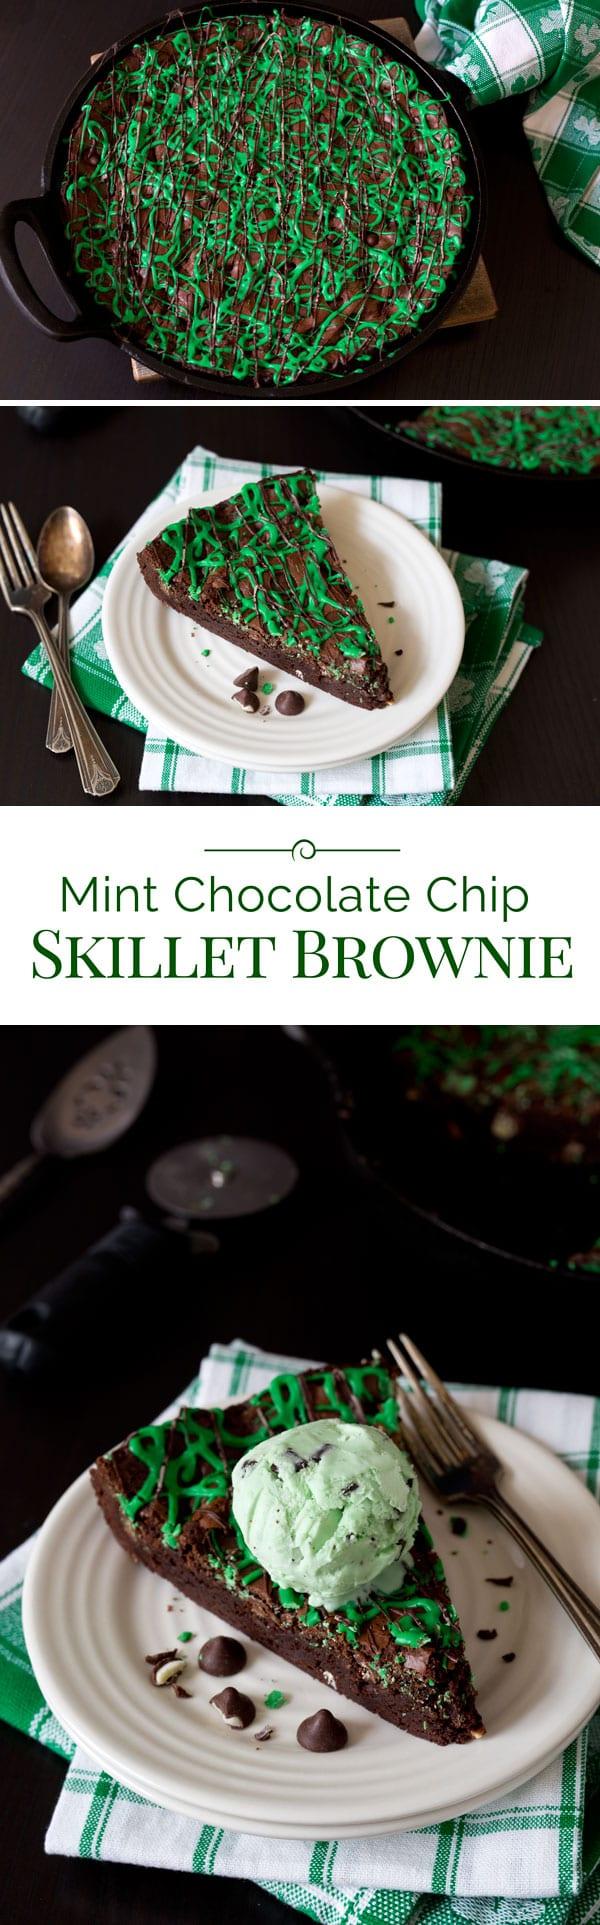 Mint-Chocolate-Chip-Skillet-Brownie-Collage-2-Barbara-Bakes